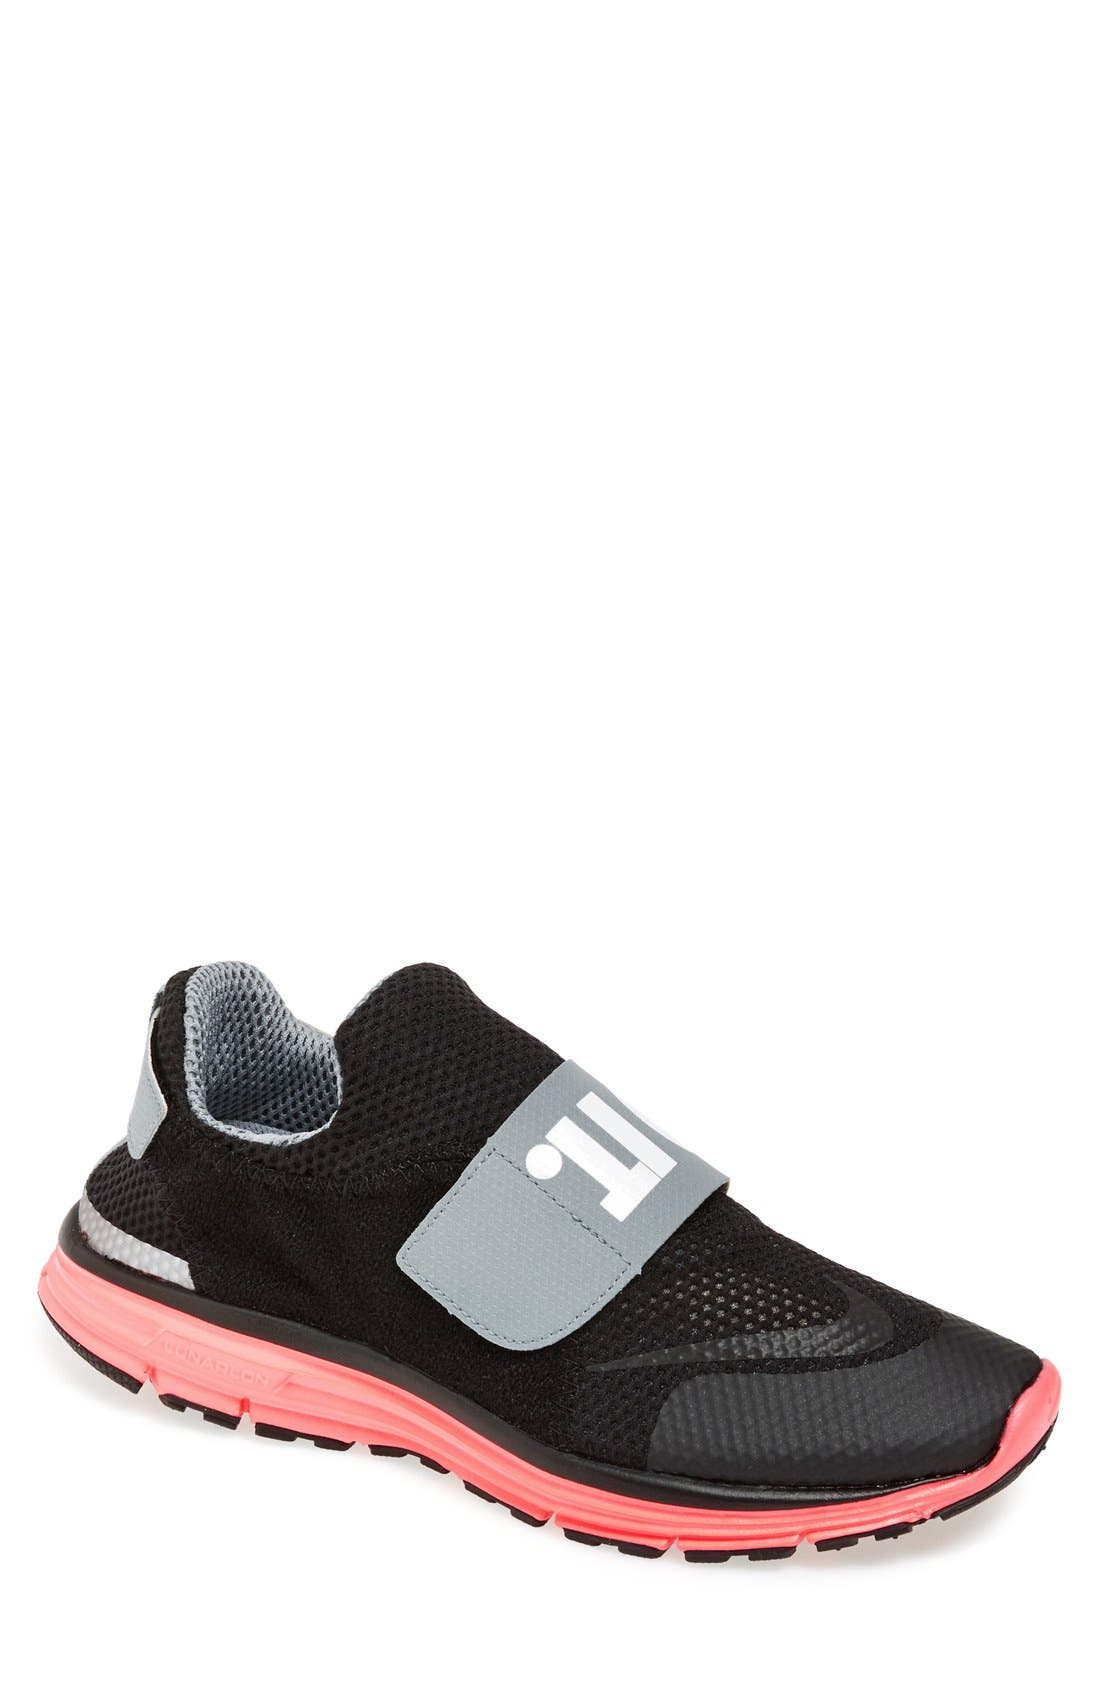 Main Image - Nike 'Lunar Fly 306' Sneaker (Men)